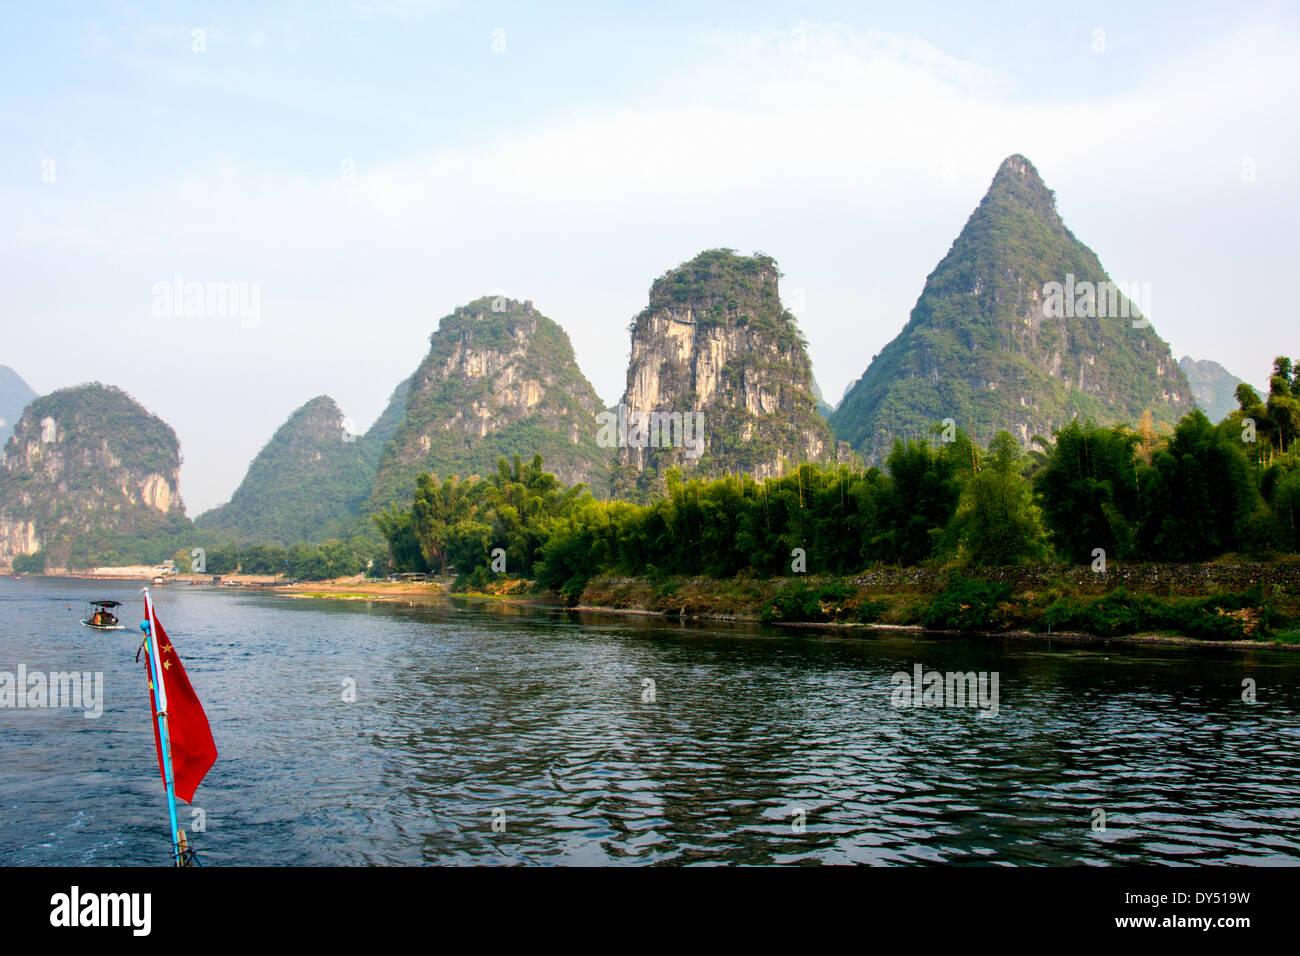 China, Yangshuo County, Li River Karst formations Stock Photo